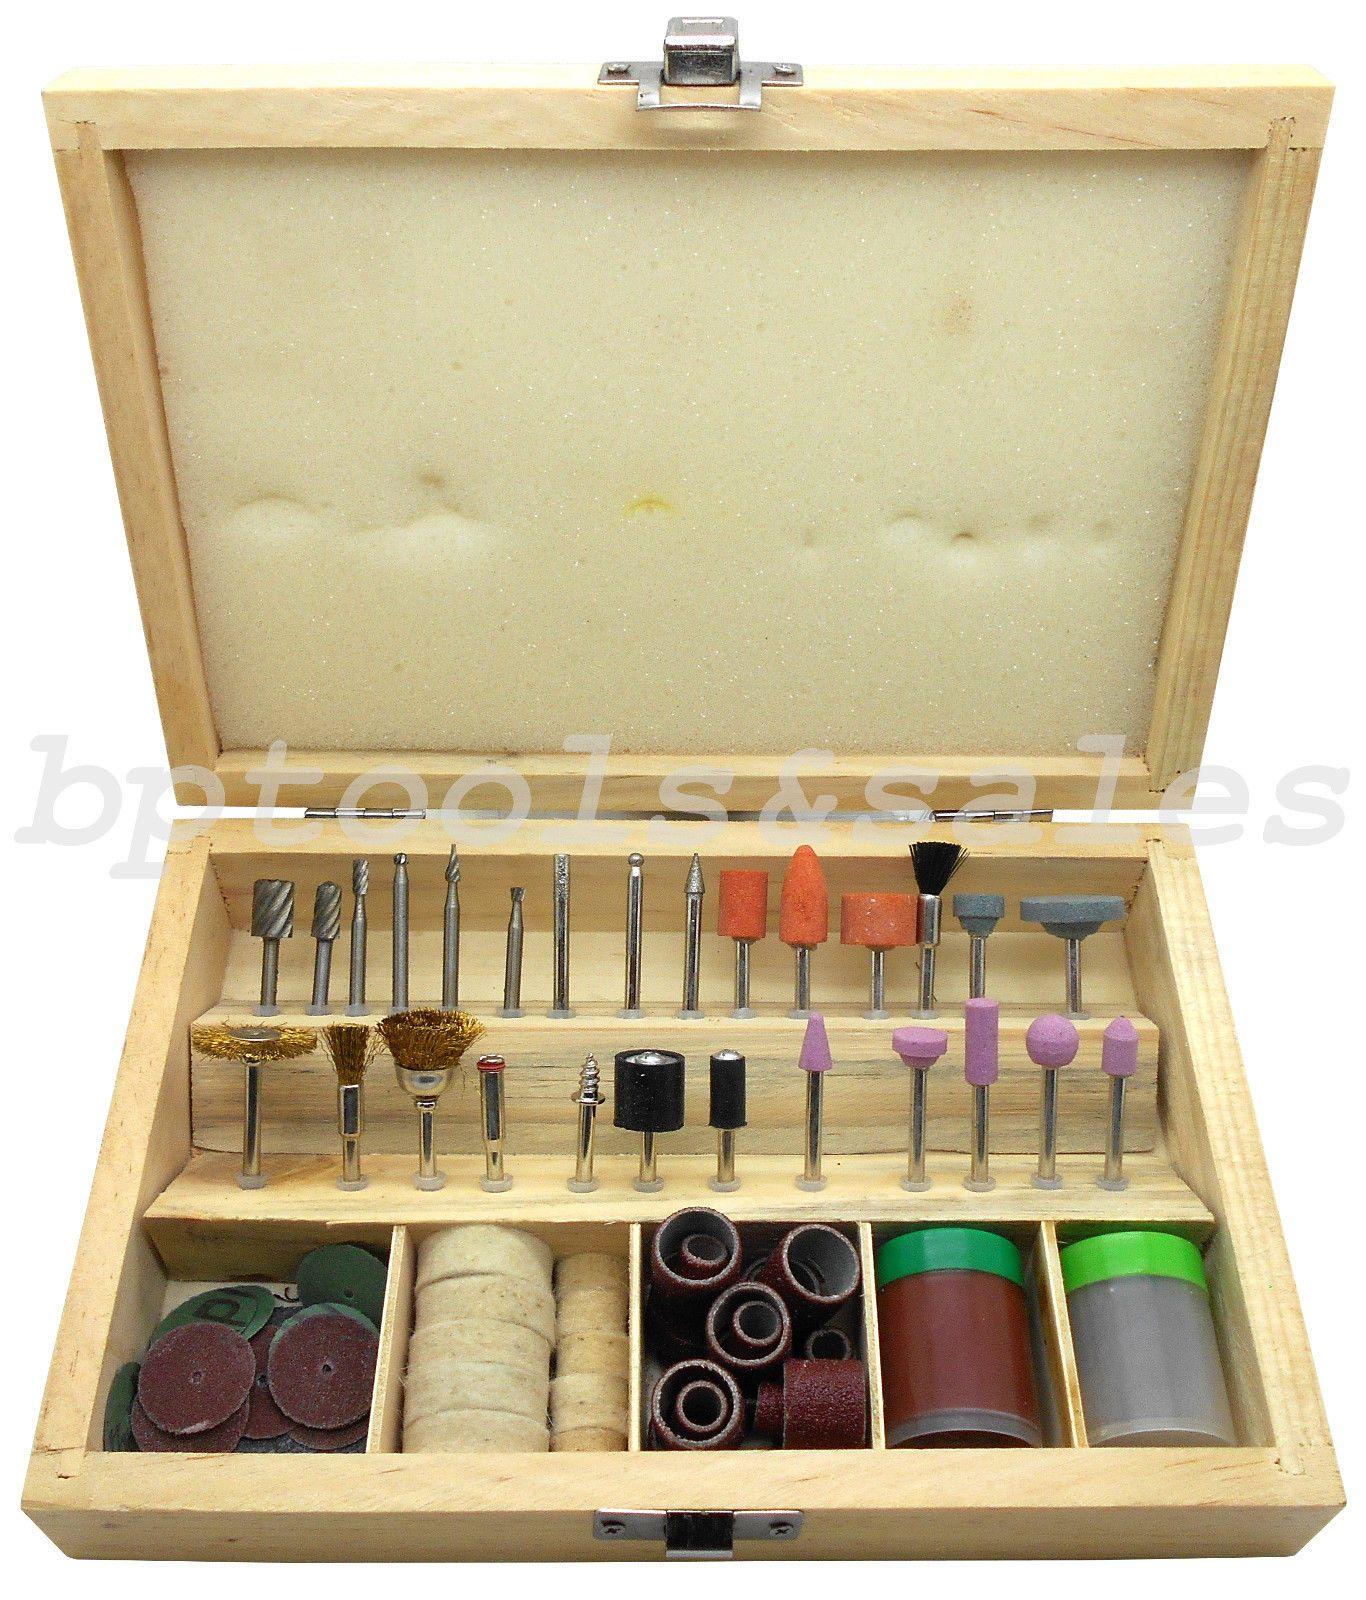 Sanding Polishing Cutting 100pc Universal Rotary Accessory Tool Kit For Dremel